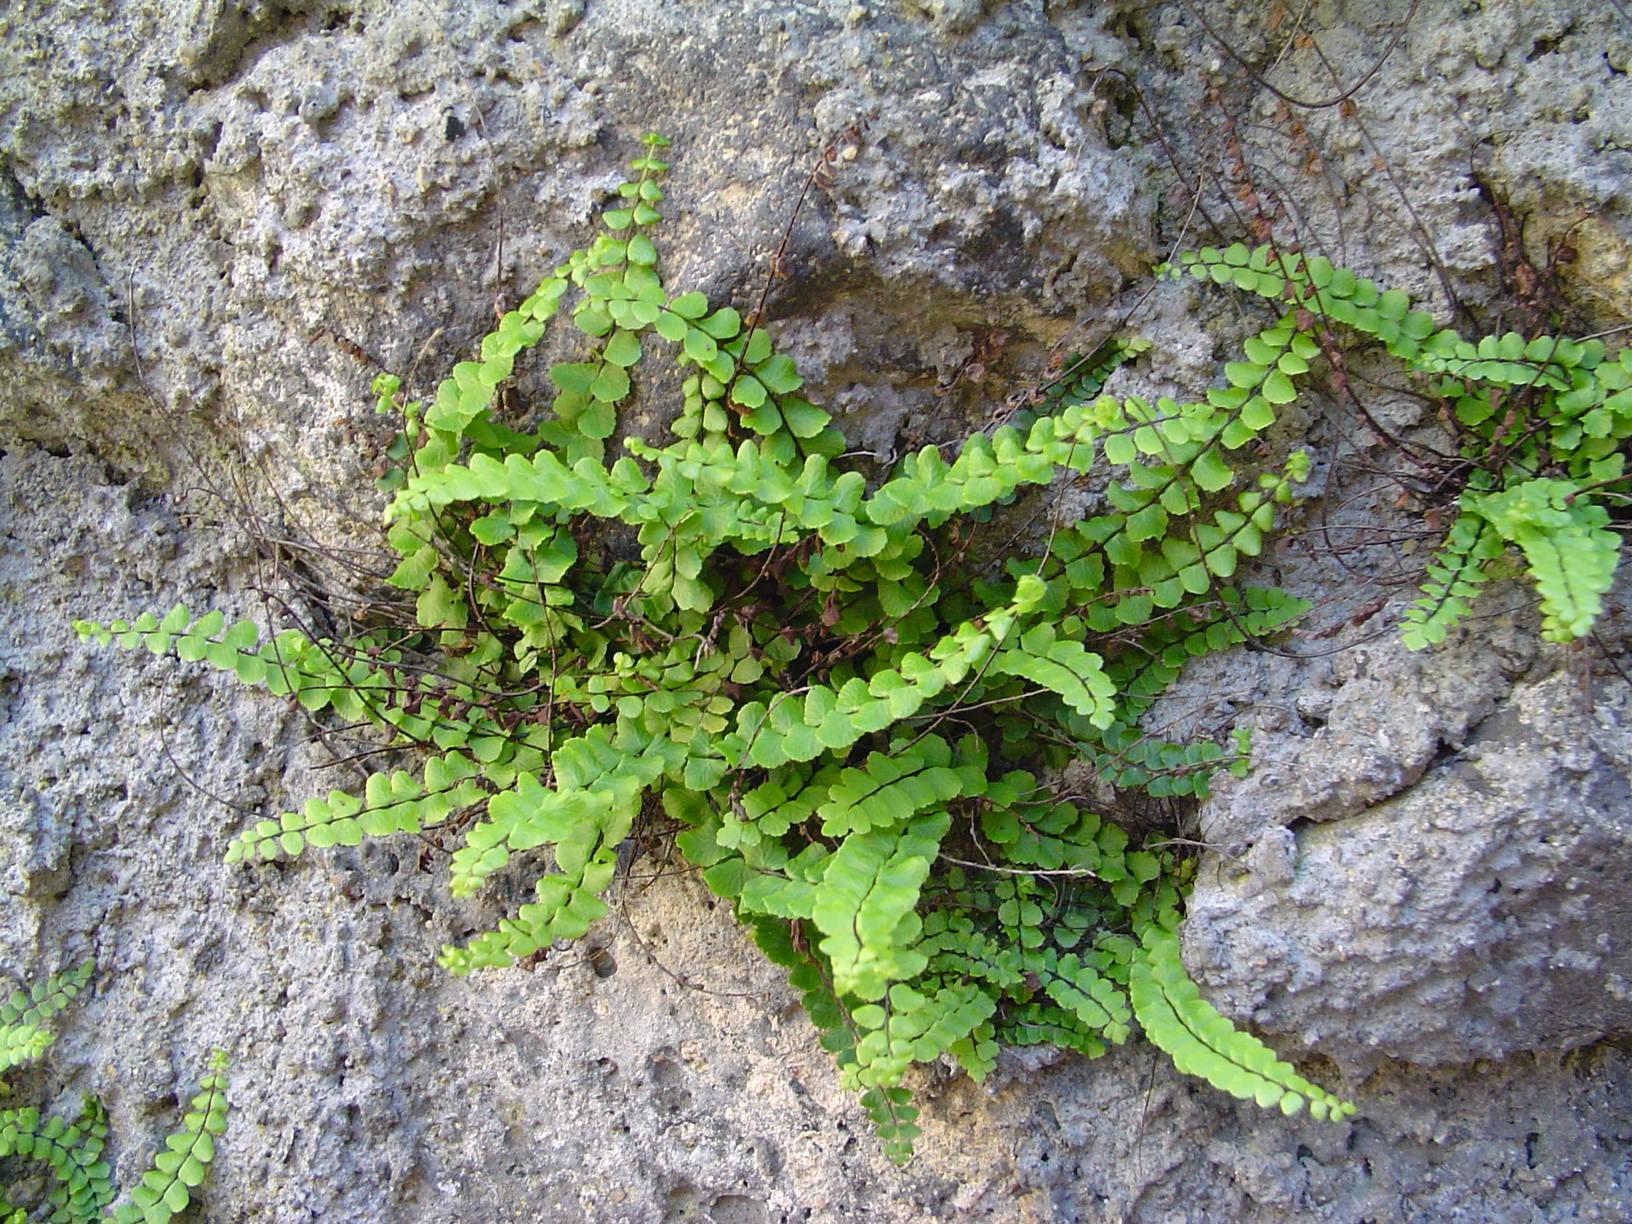 Asplenium Trichomanes Wikipedia File:asplenium Trichomanes